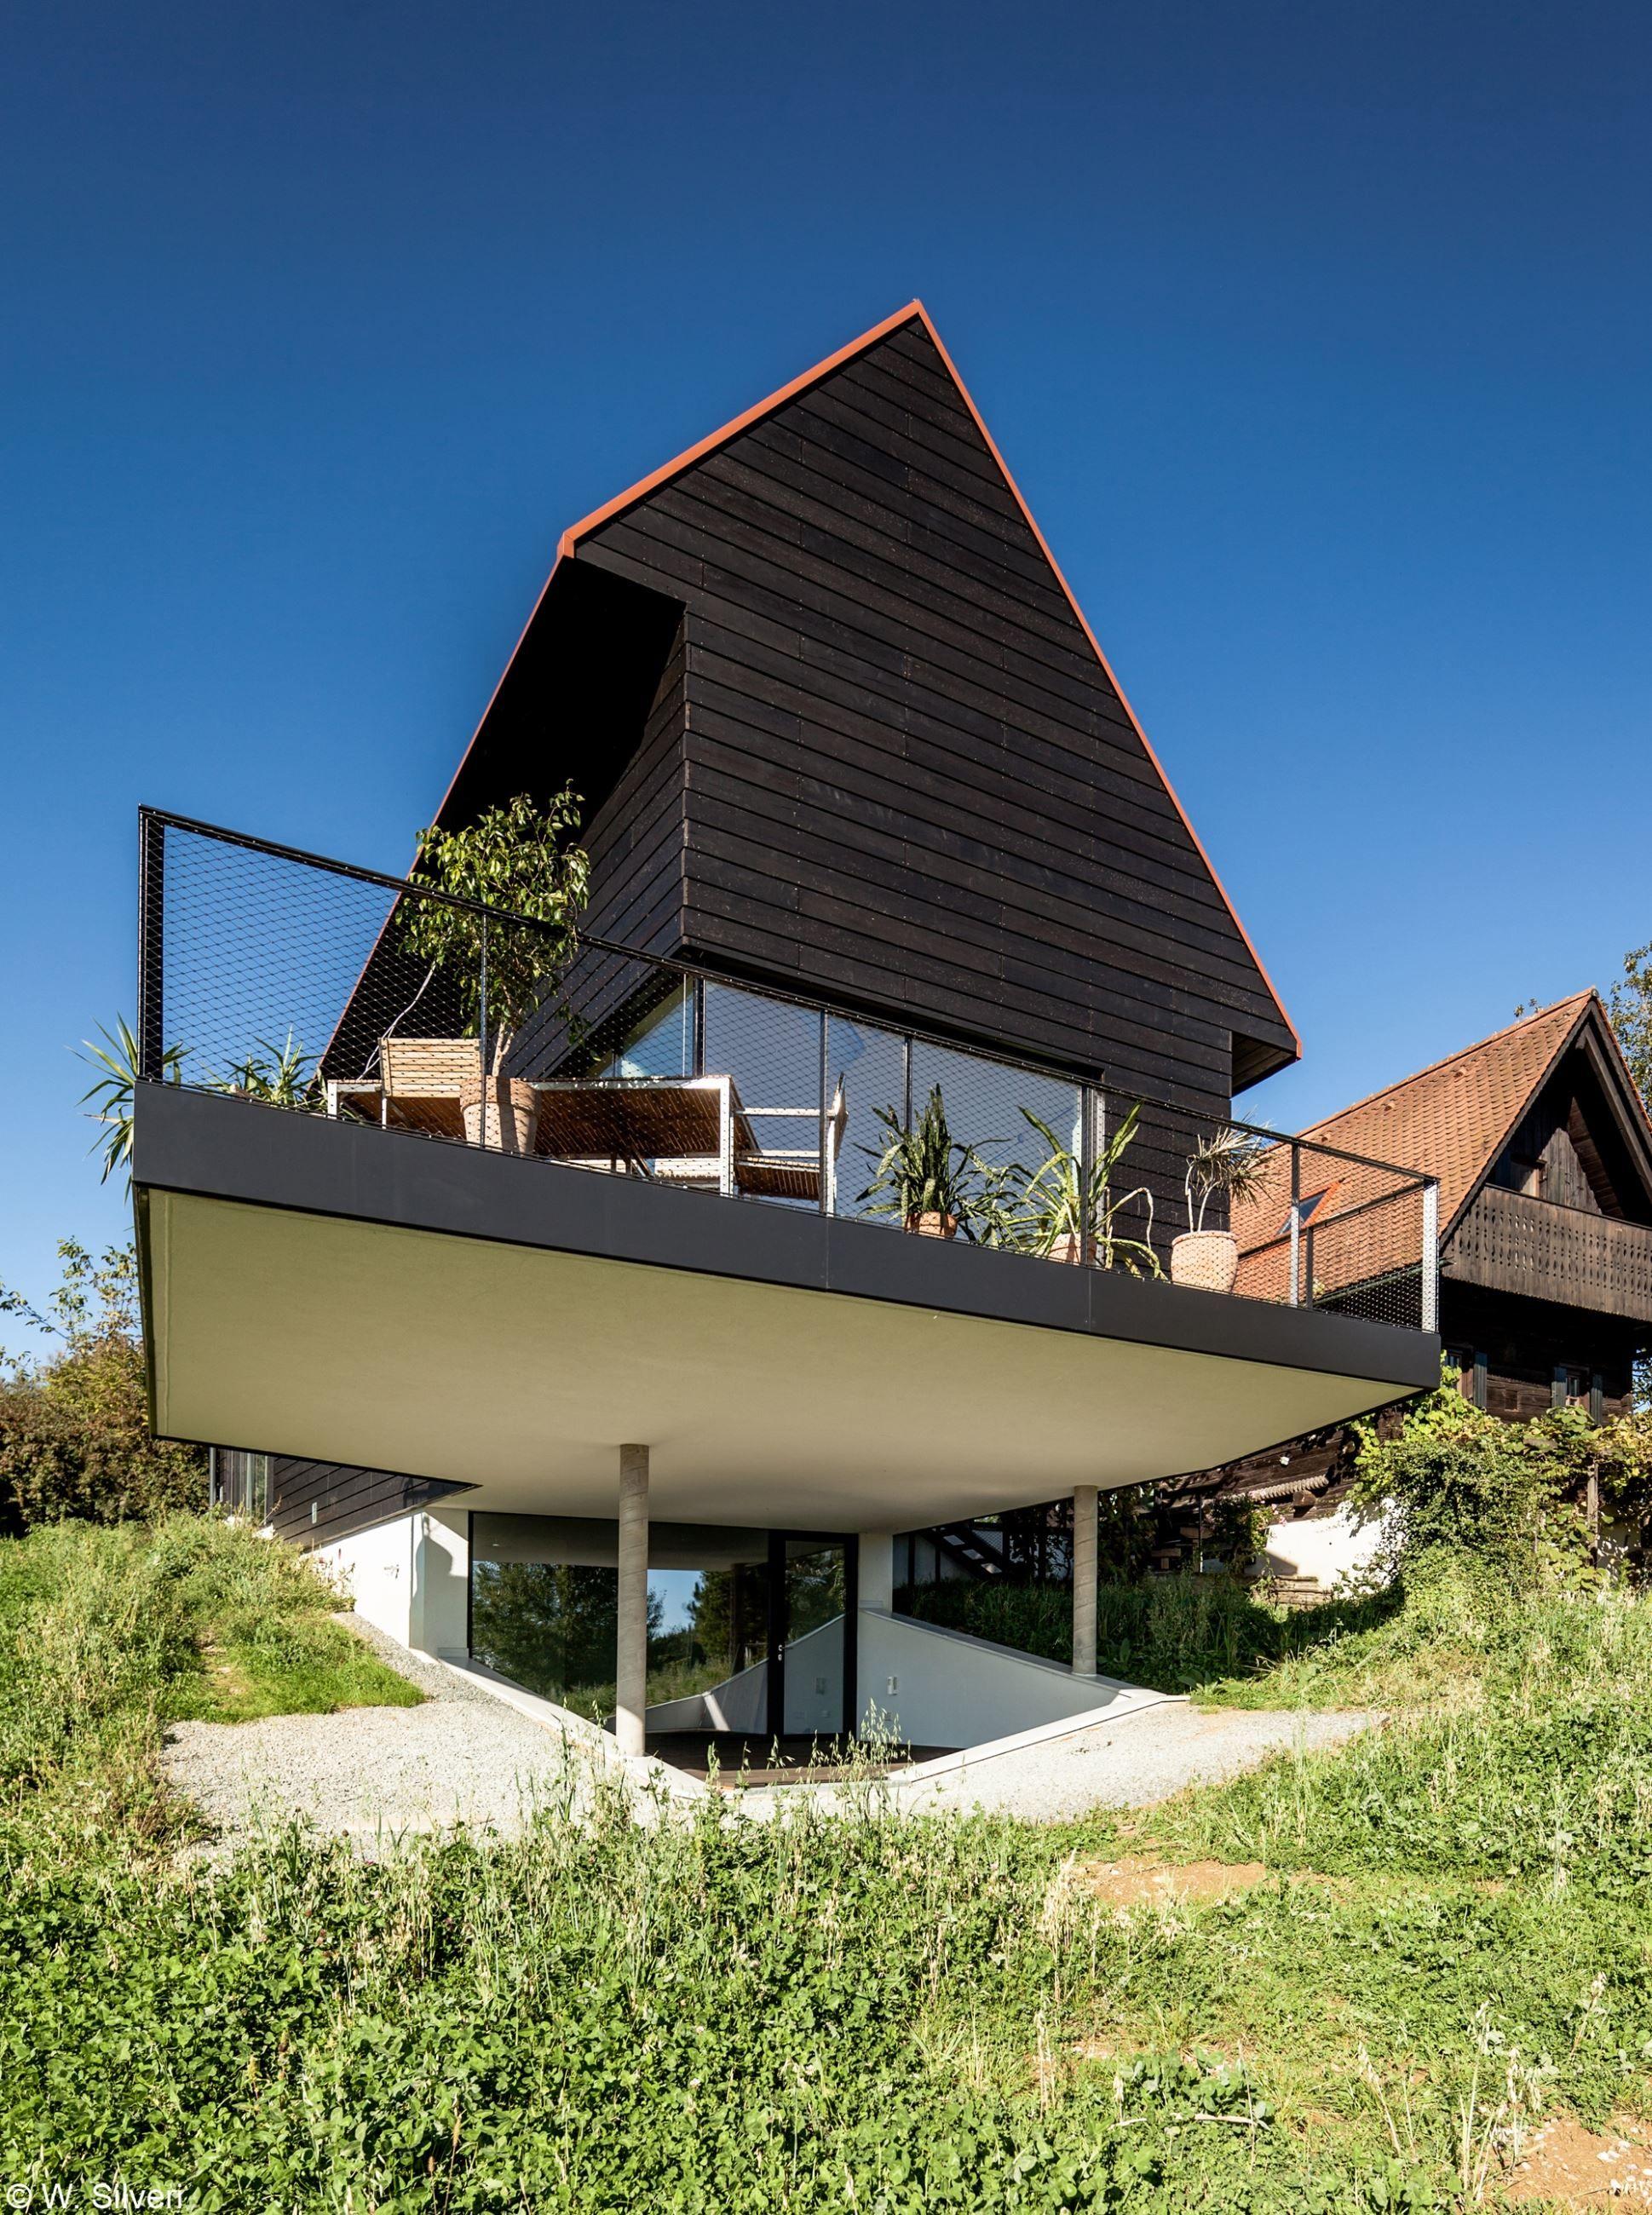 Archello | Rodinné domy RD | Pinterest | Haus